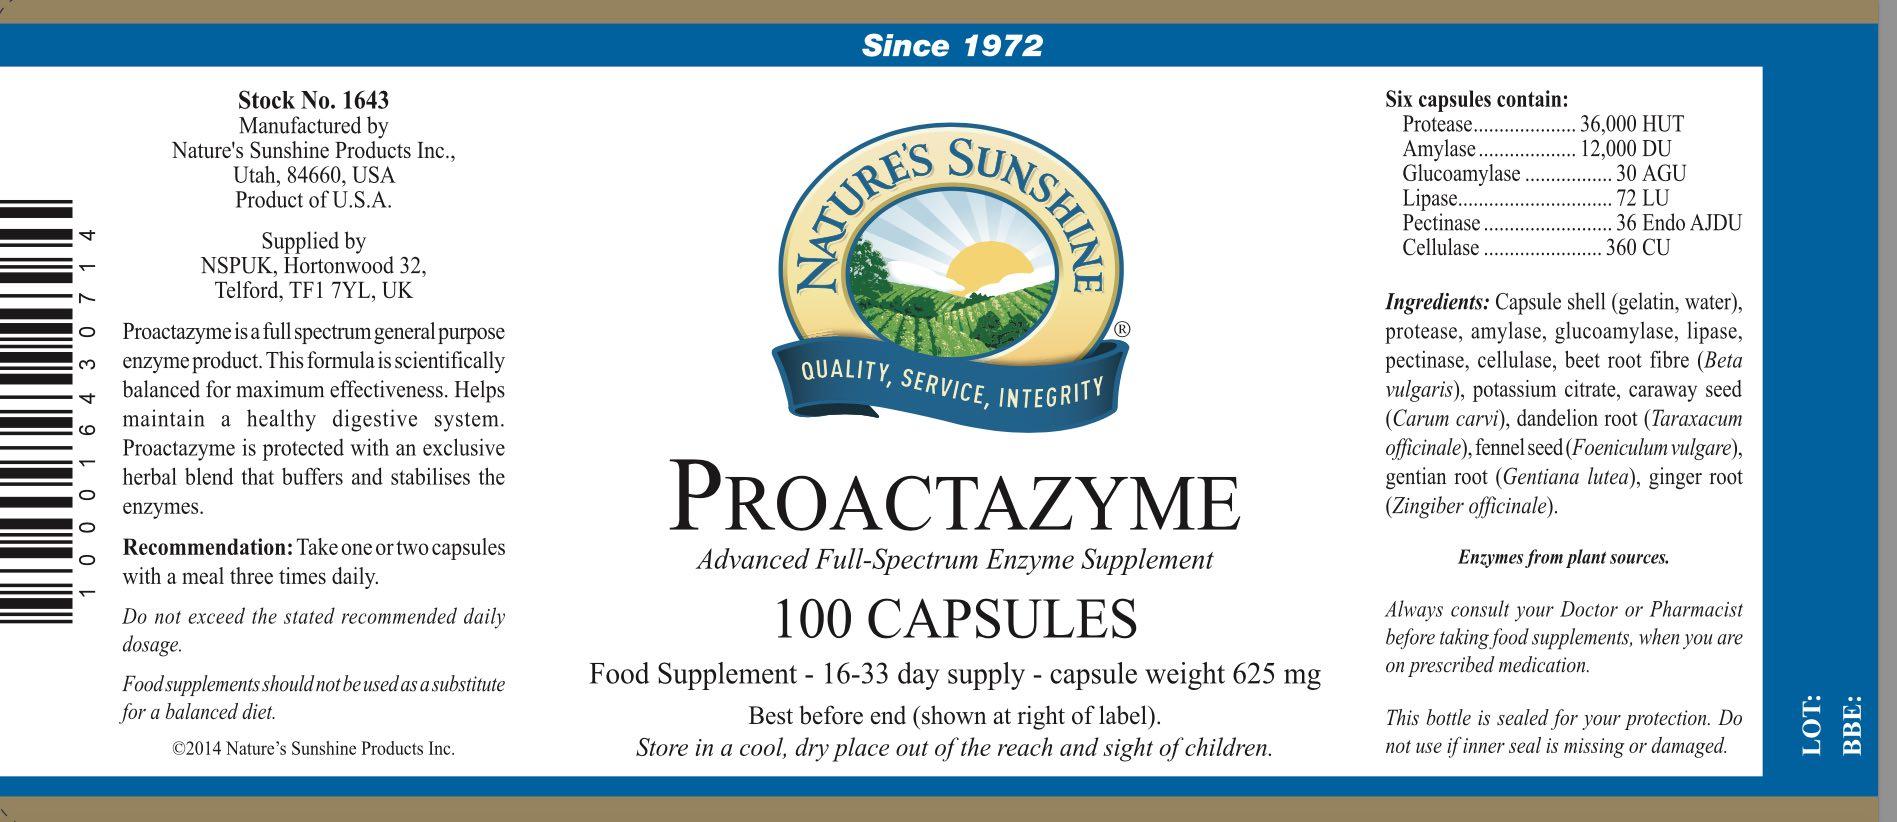 Nature's Sunshine - Proactazyme - Label